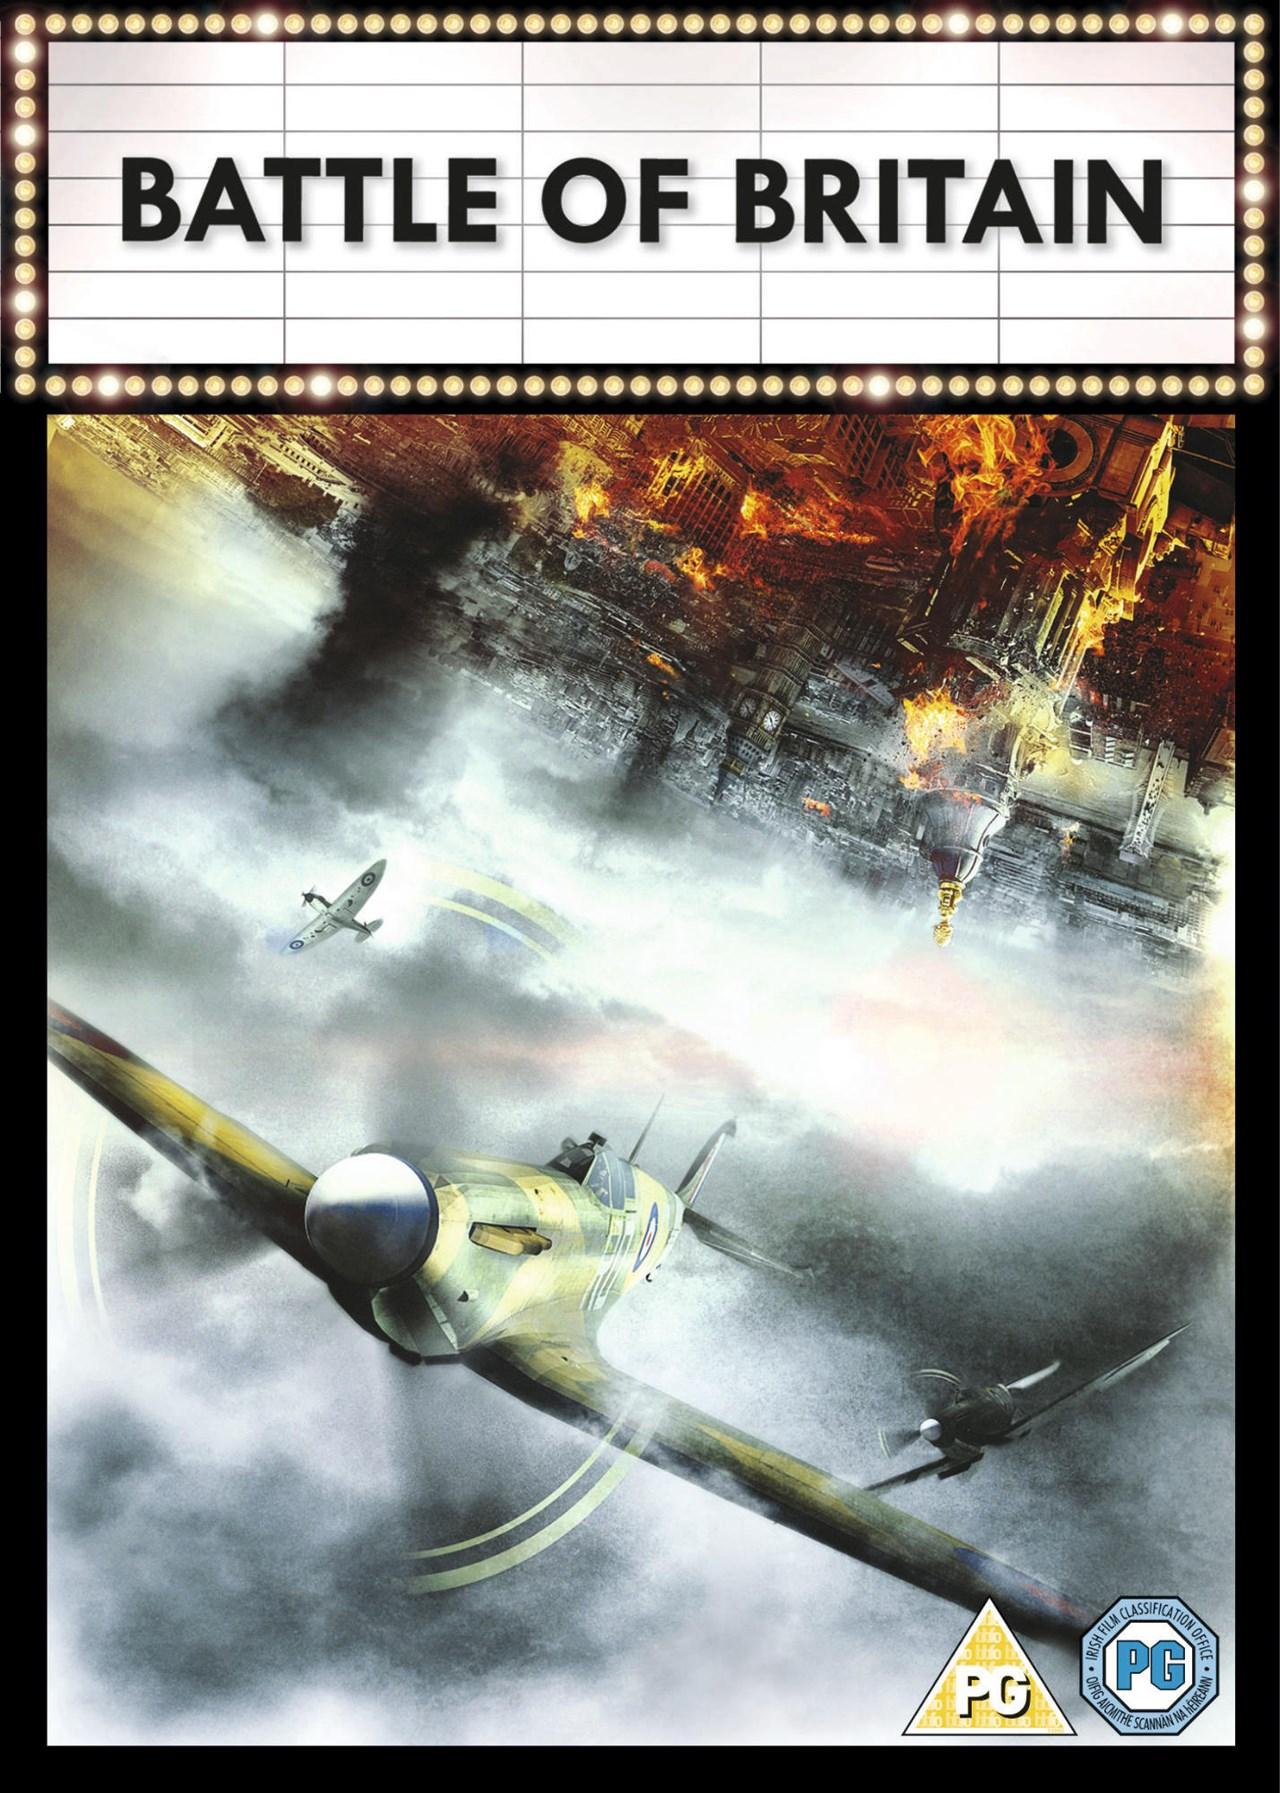 Battle of Britain - 1